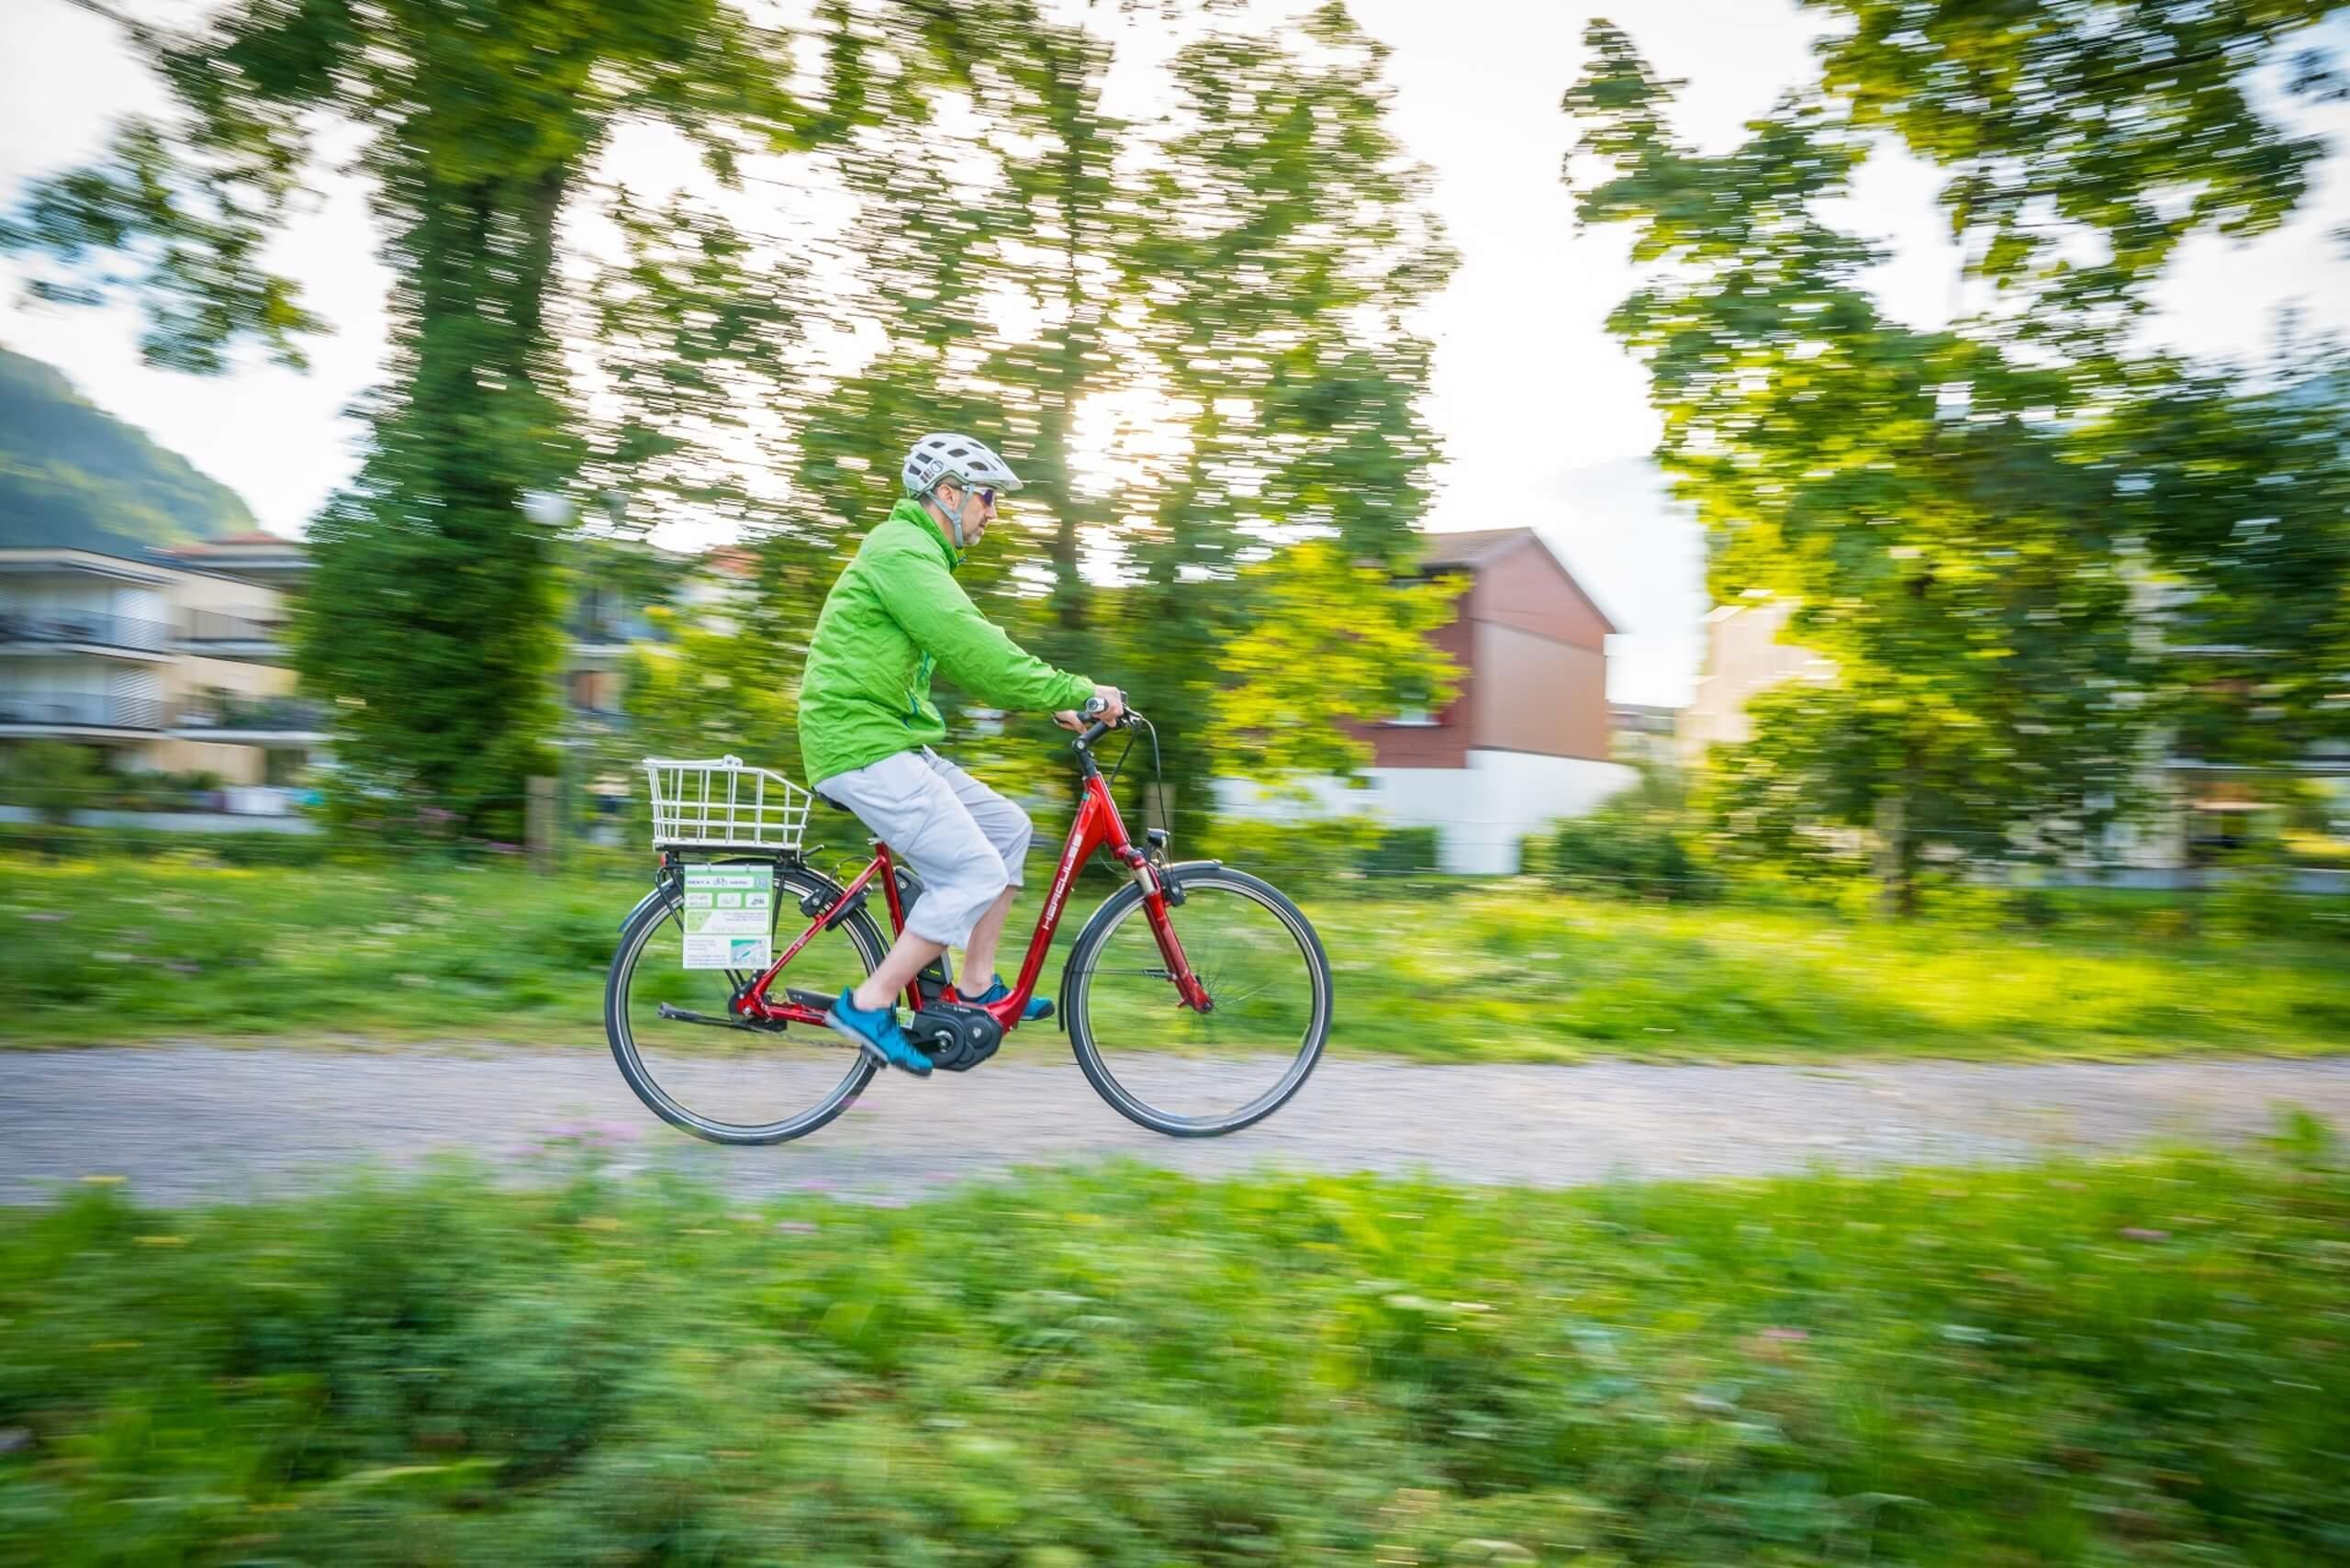 interlaken-flying-wheels-fahrrad-tour